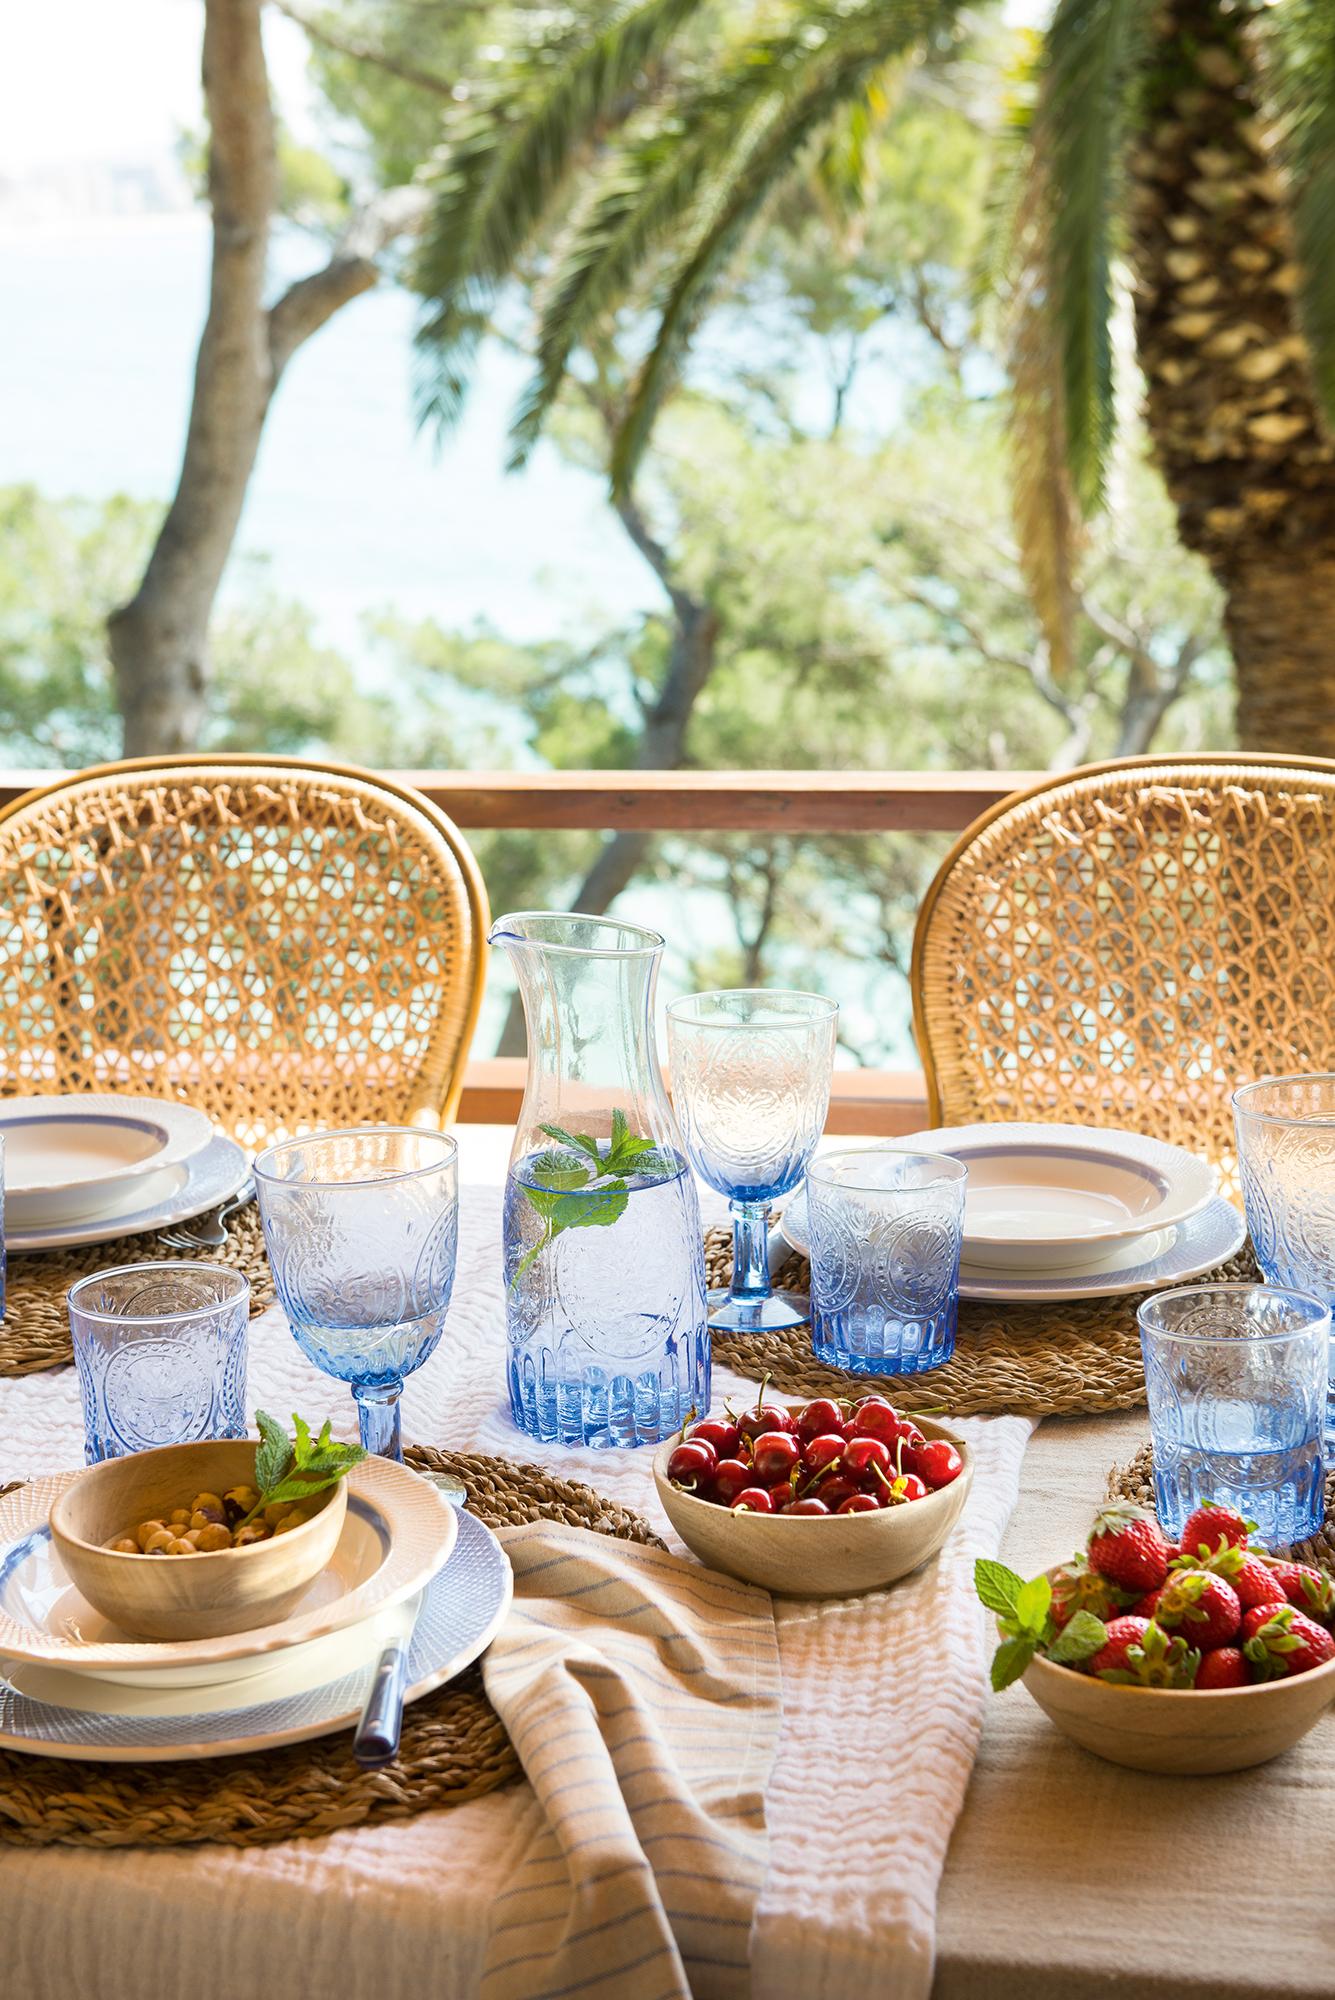 16 ideas para decorar tus mesas de verano